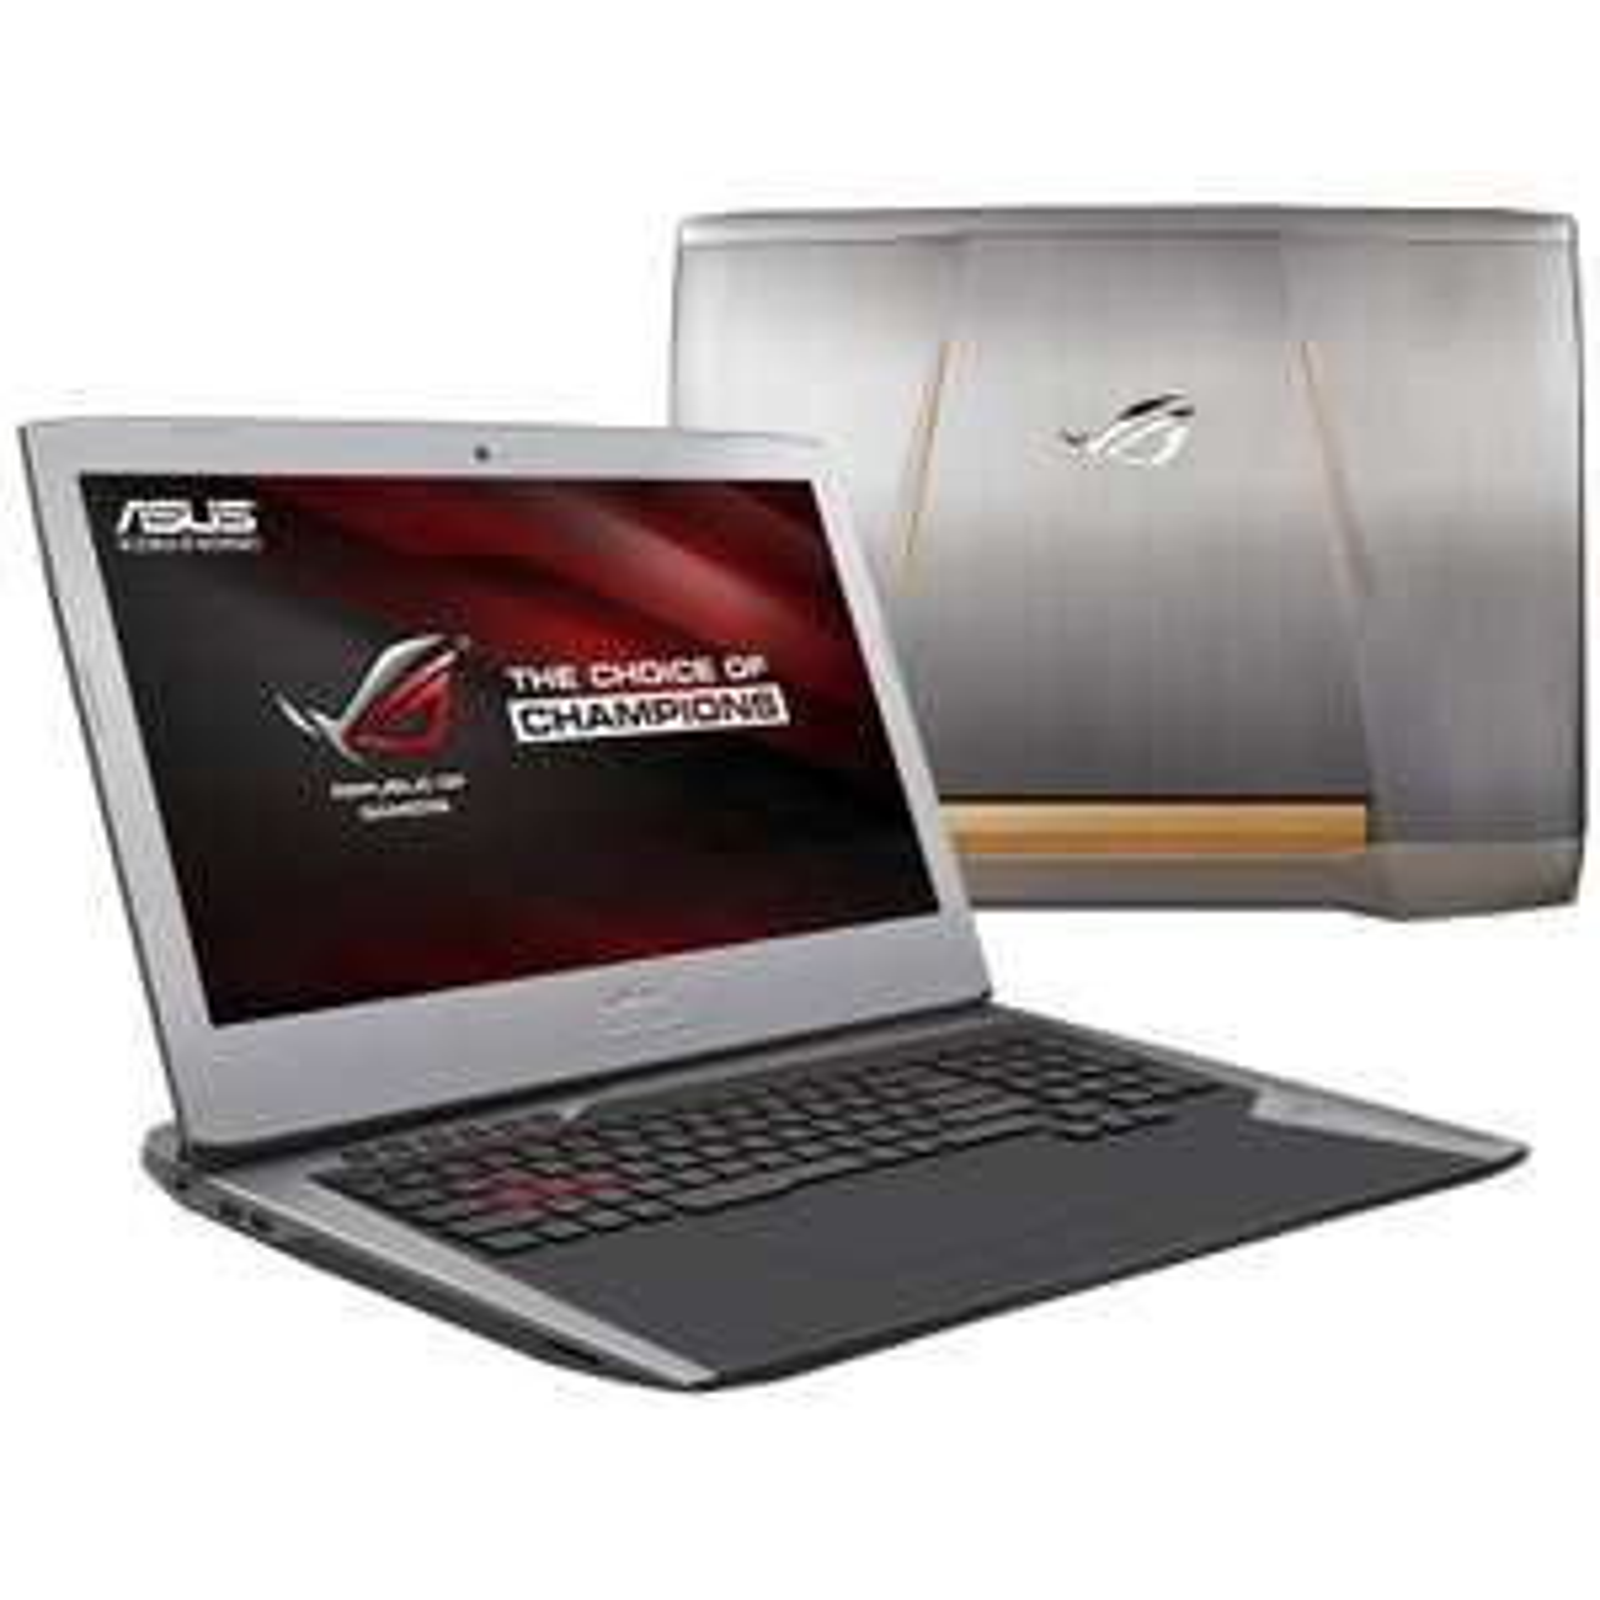 "[Cdiscount à volonté] PC Portable 17.3"" Asus Rog G752VY-GC183T - 32Go de RAM - i7-6820 - GTX 980M - 1To + 512Go SSD"